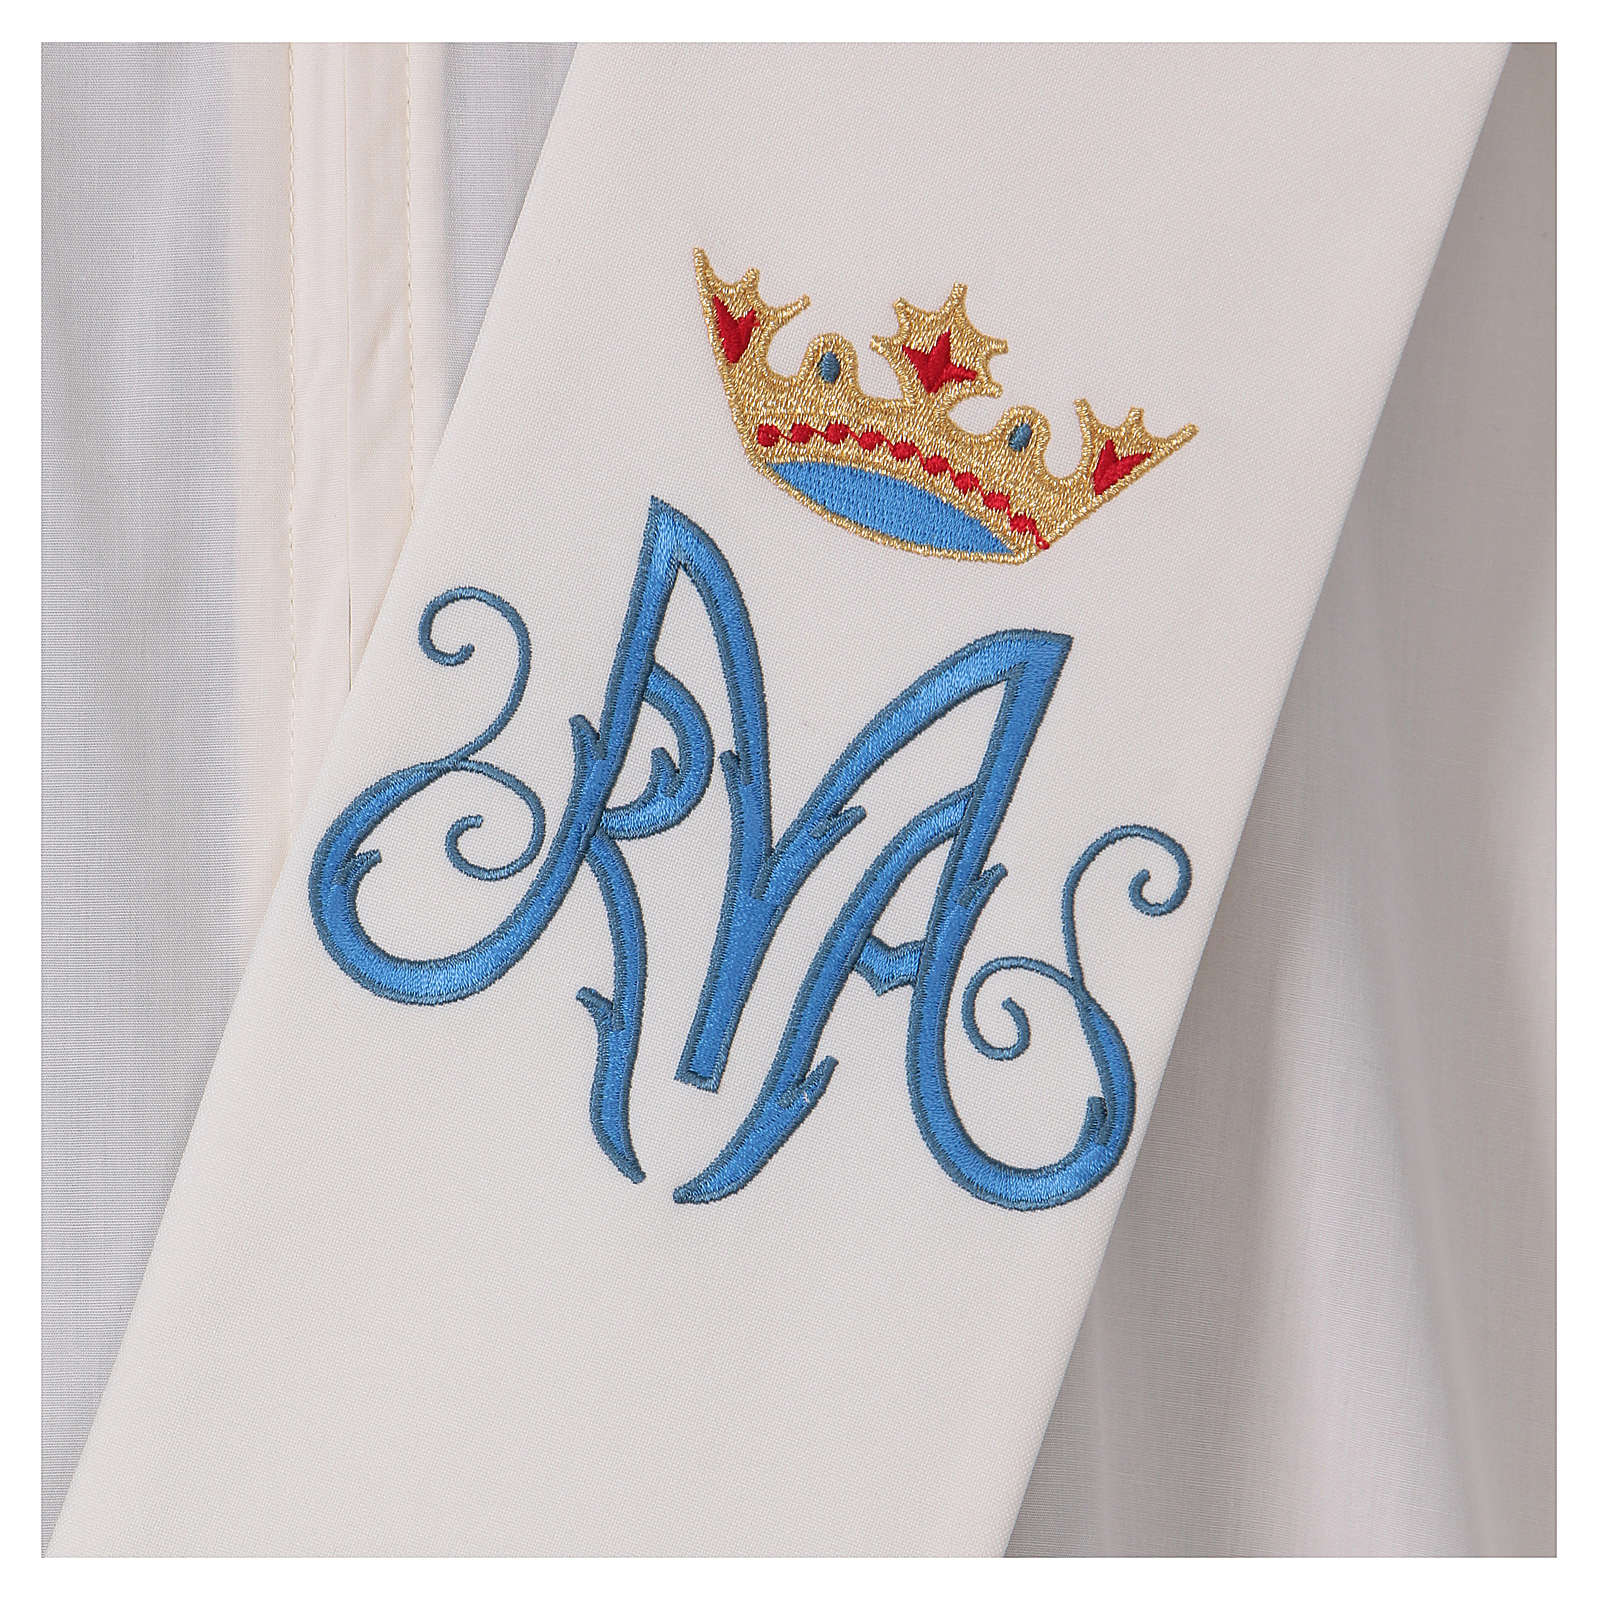 Estola diaconal marfil símbolo mariano con corona 80% poliéster 20% lana 4